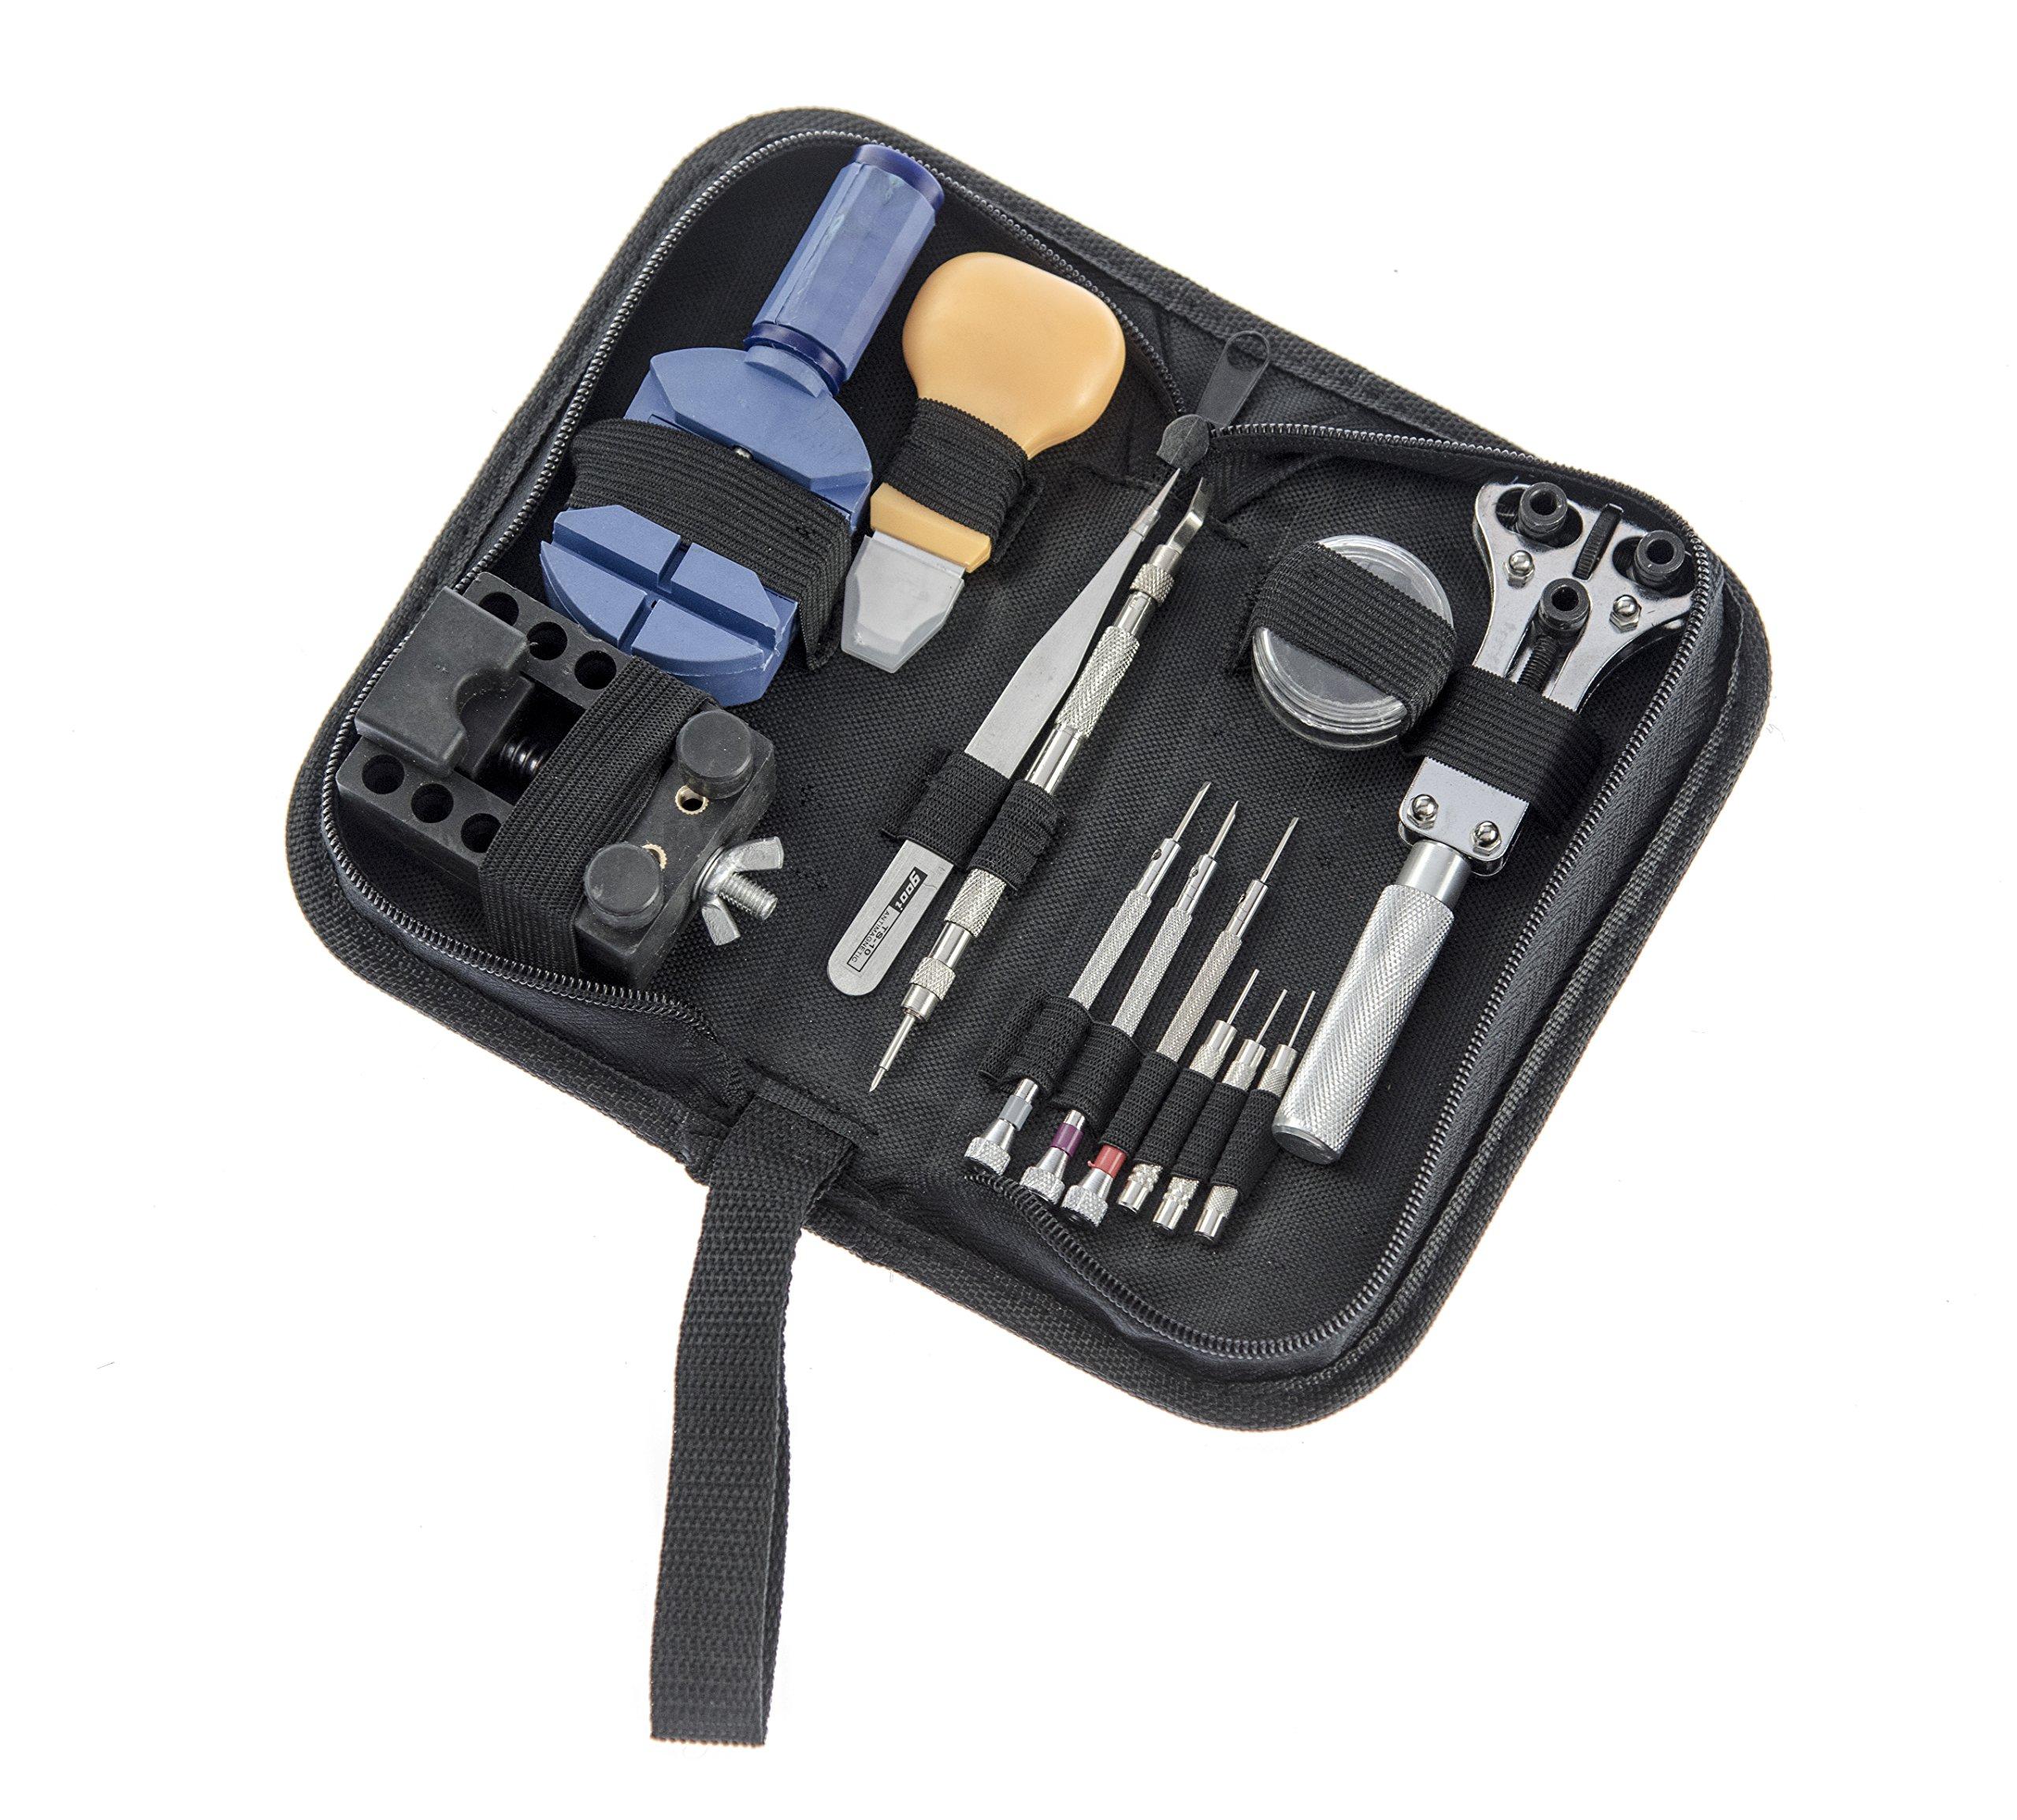 SE JT6222-CHINA Watch Repair Tool Kit, 13-Piece